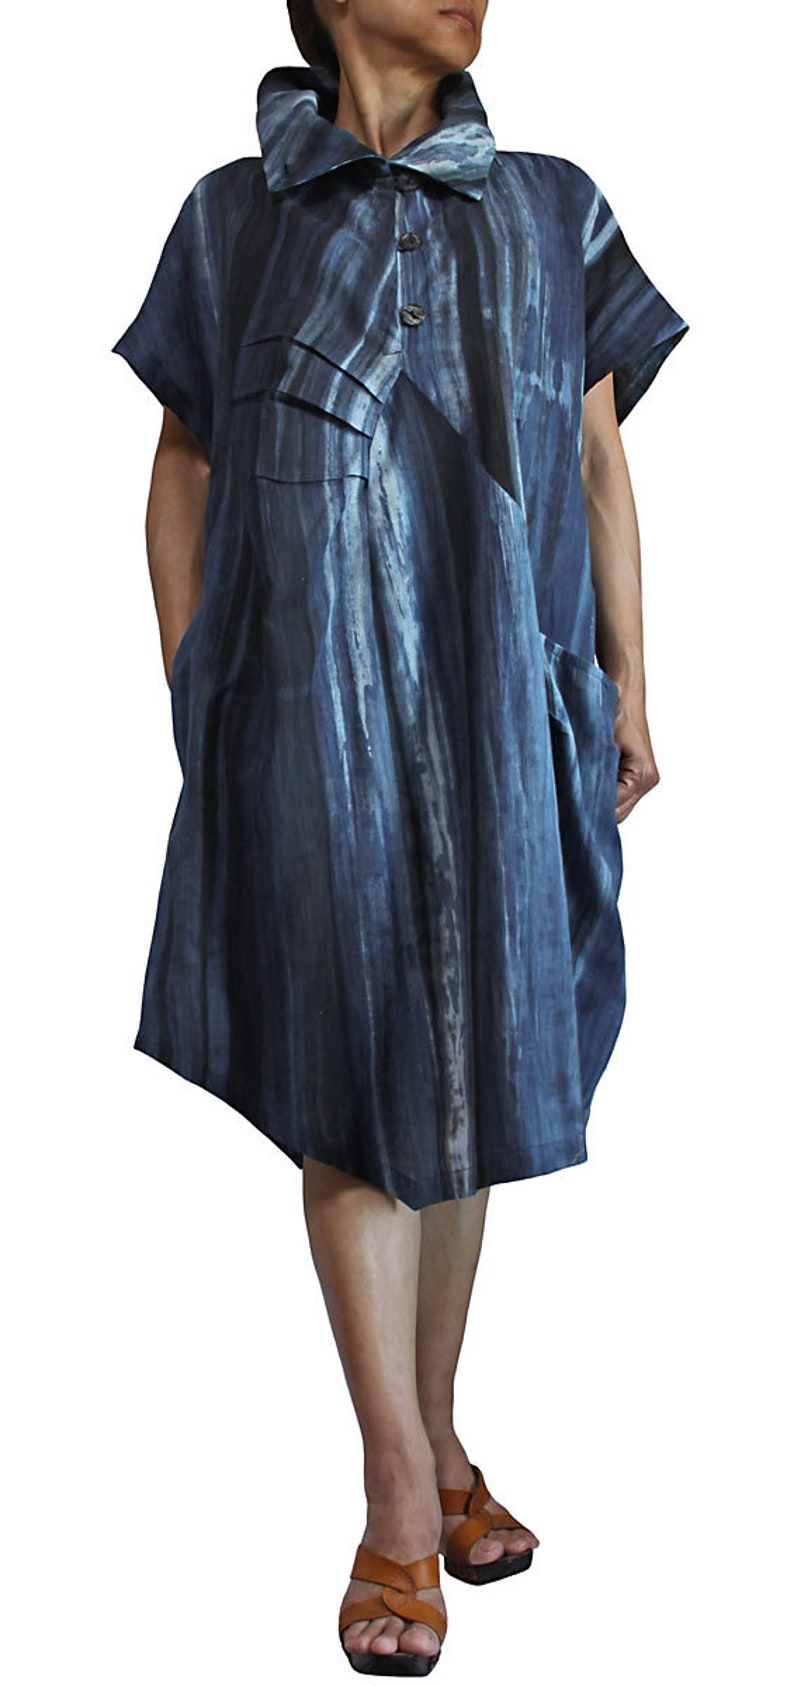 DRL-005 Natural Indigo Dyed Long Tunic Dress